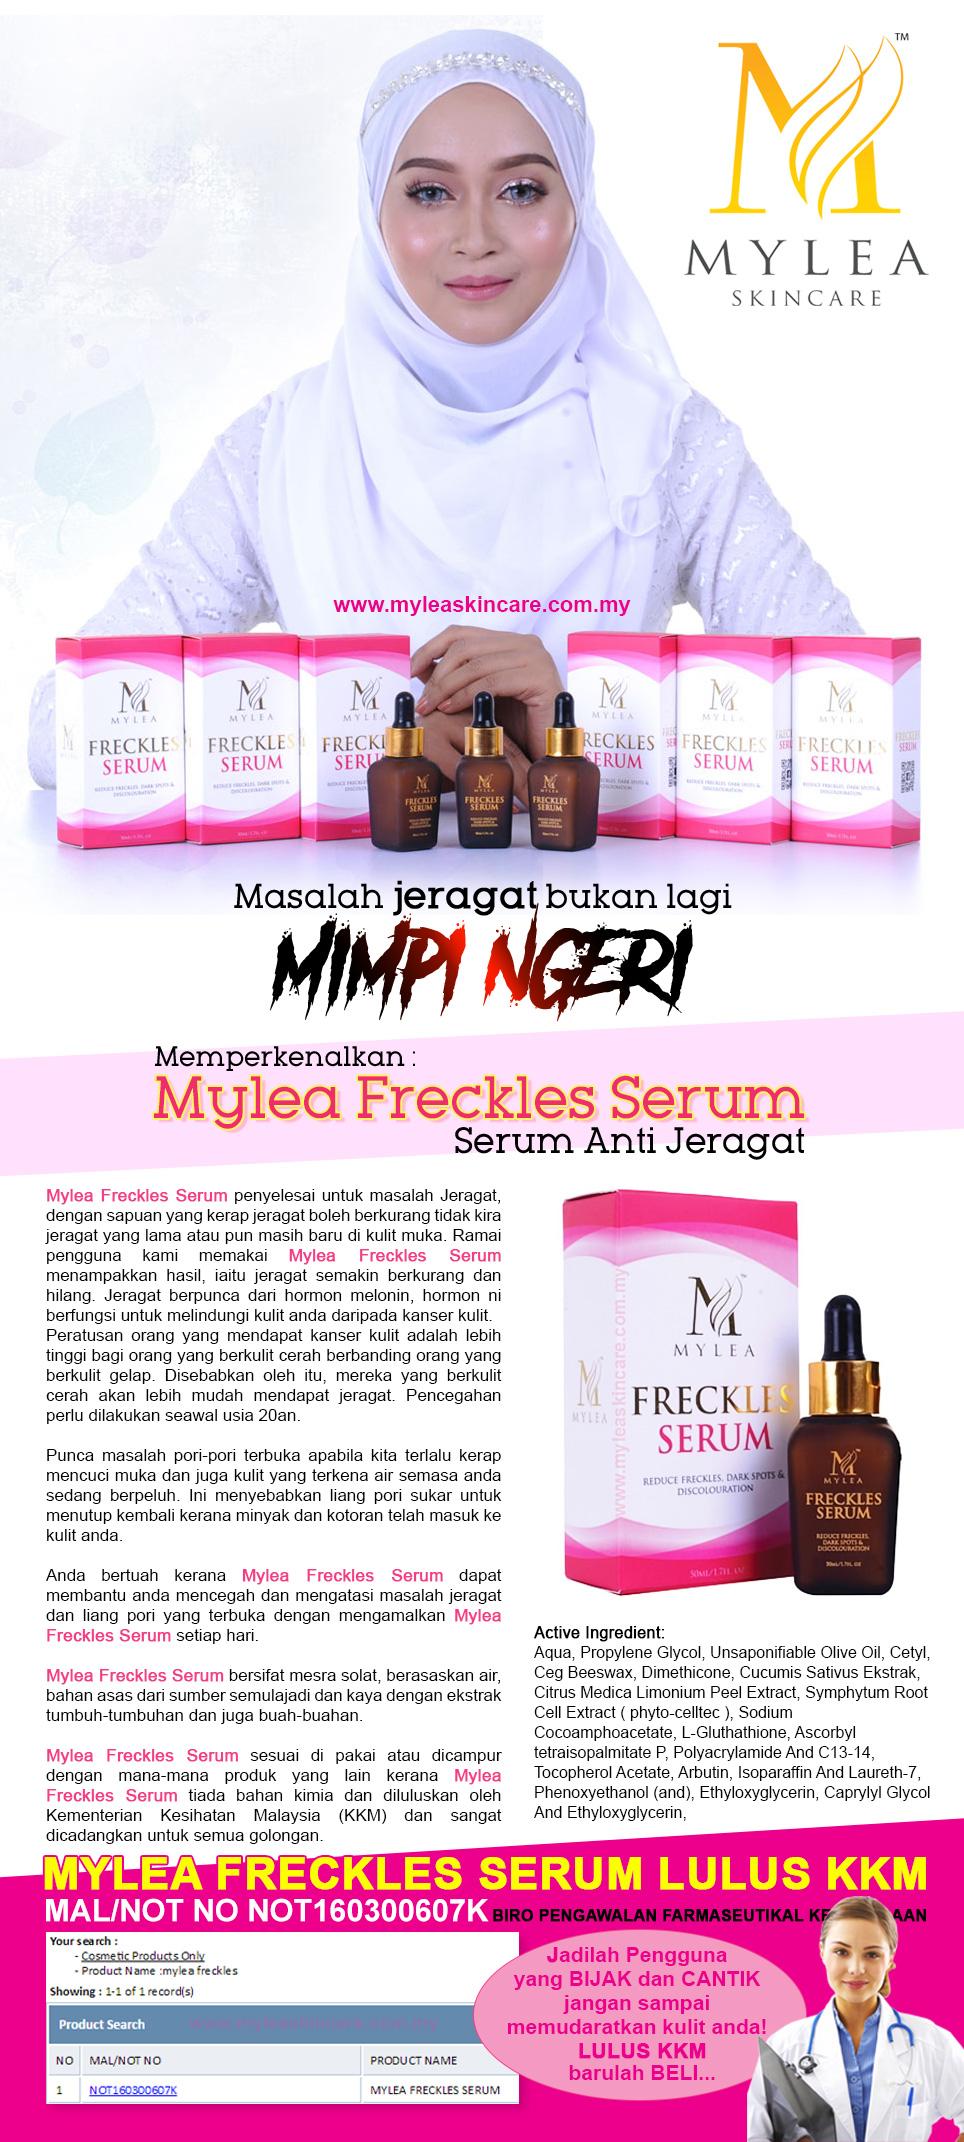 Mylea_Freckles_Serum_Lulus_KKM_Testimoni_Bahaya_Landing_Page_1.jpg